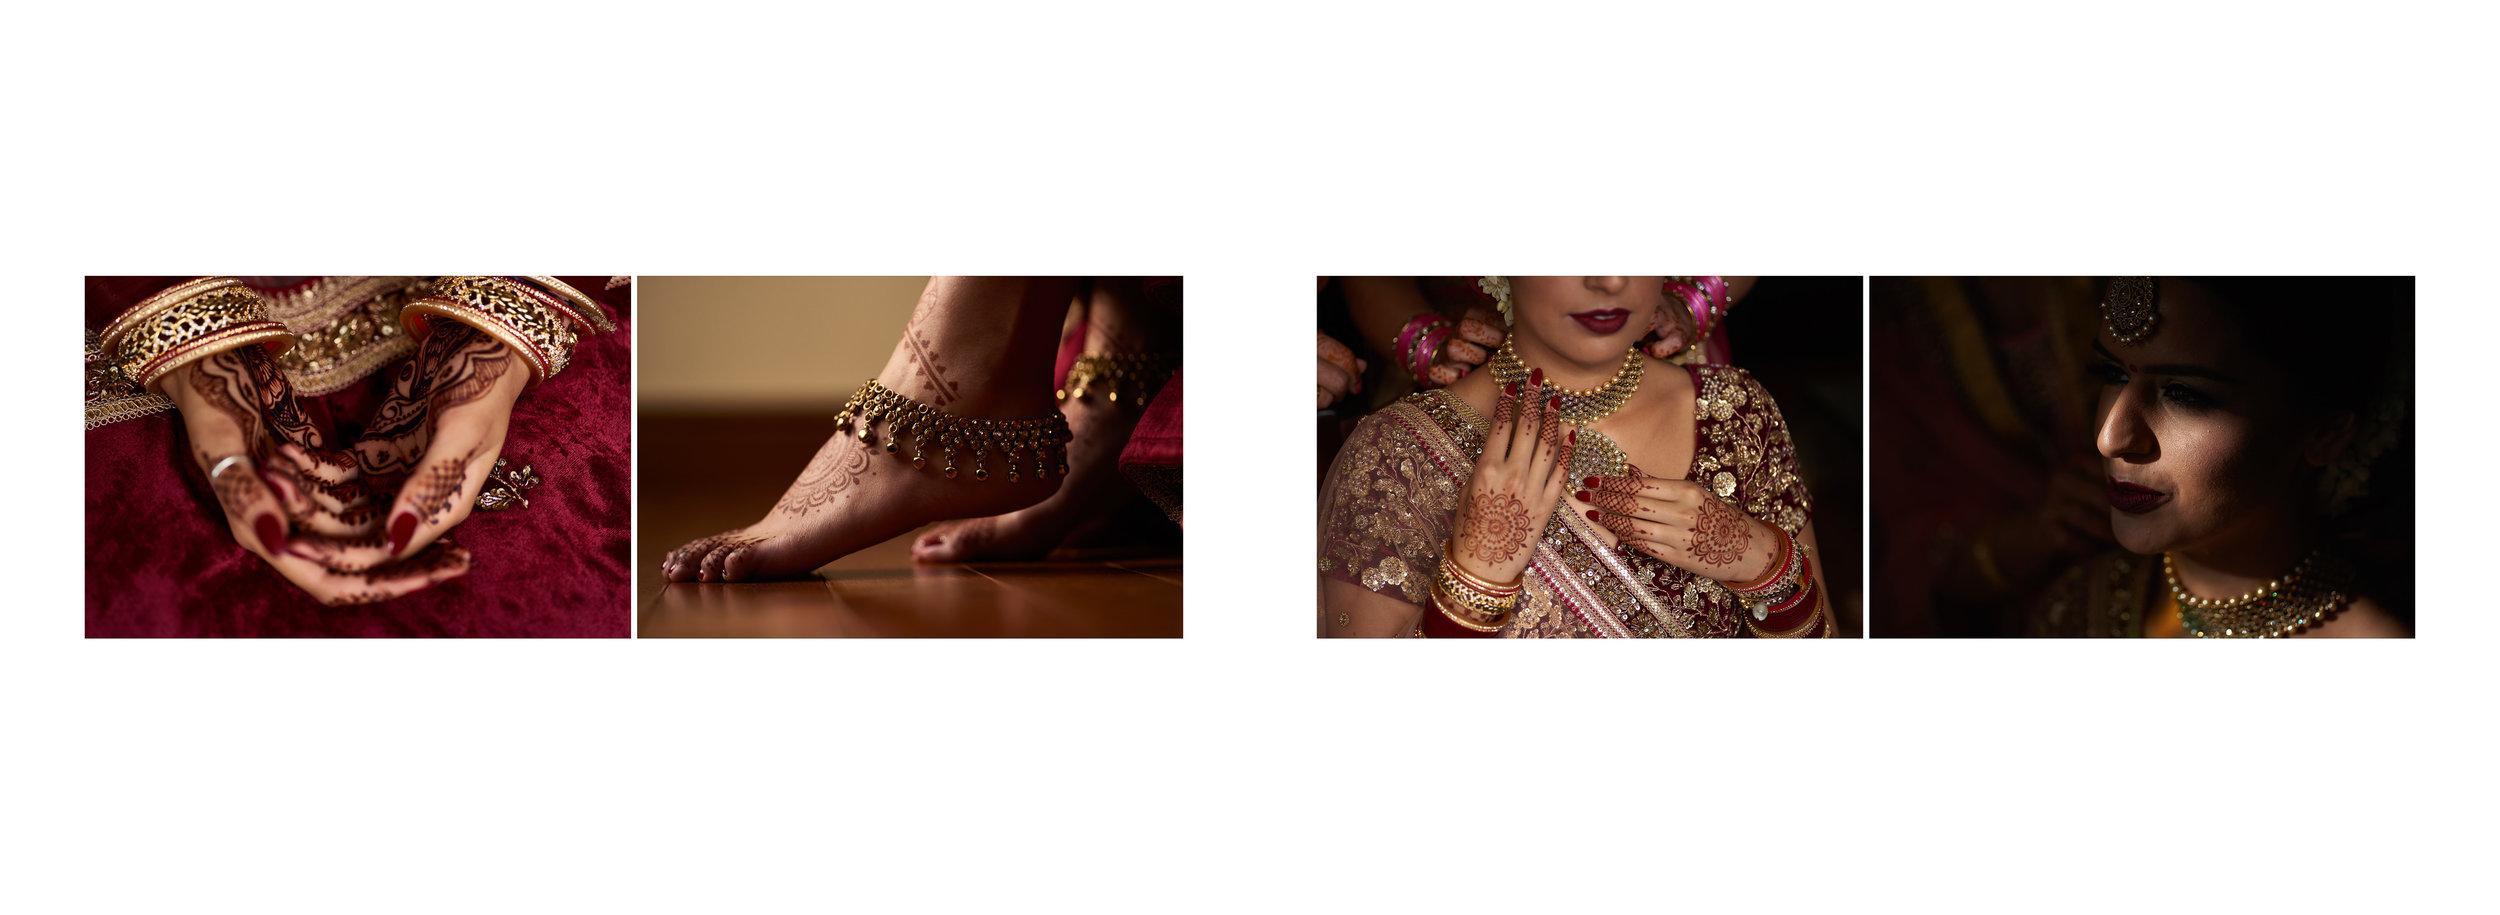 Sikh Wedding Album spread 6 - bride outfit closeups